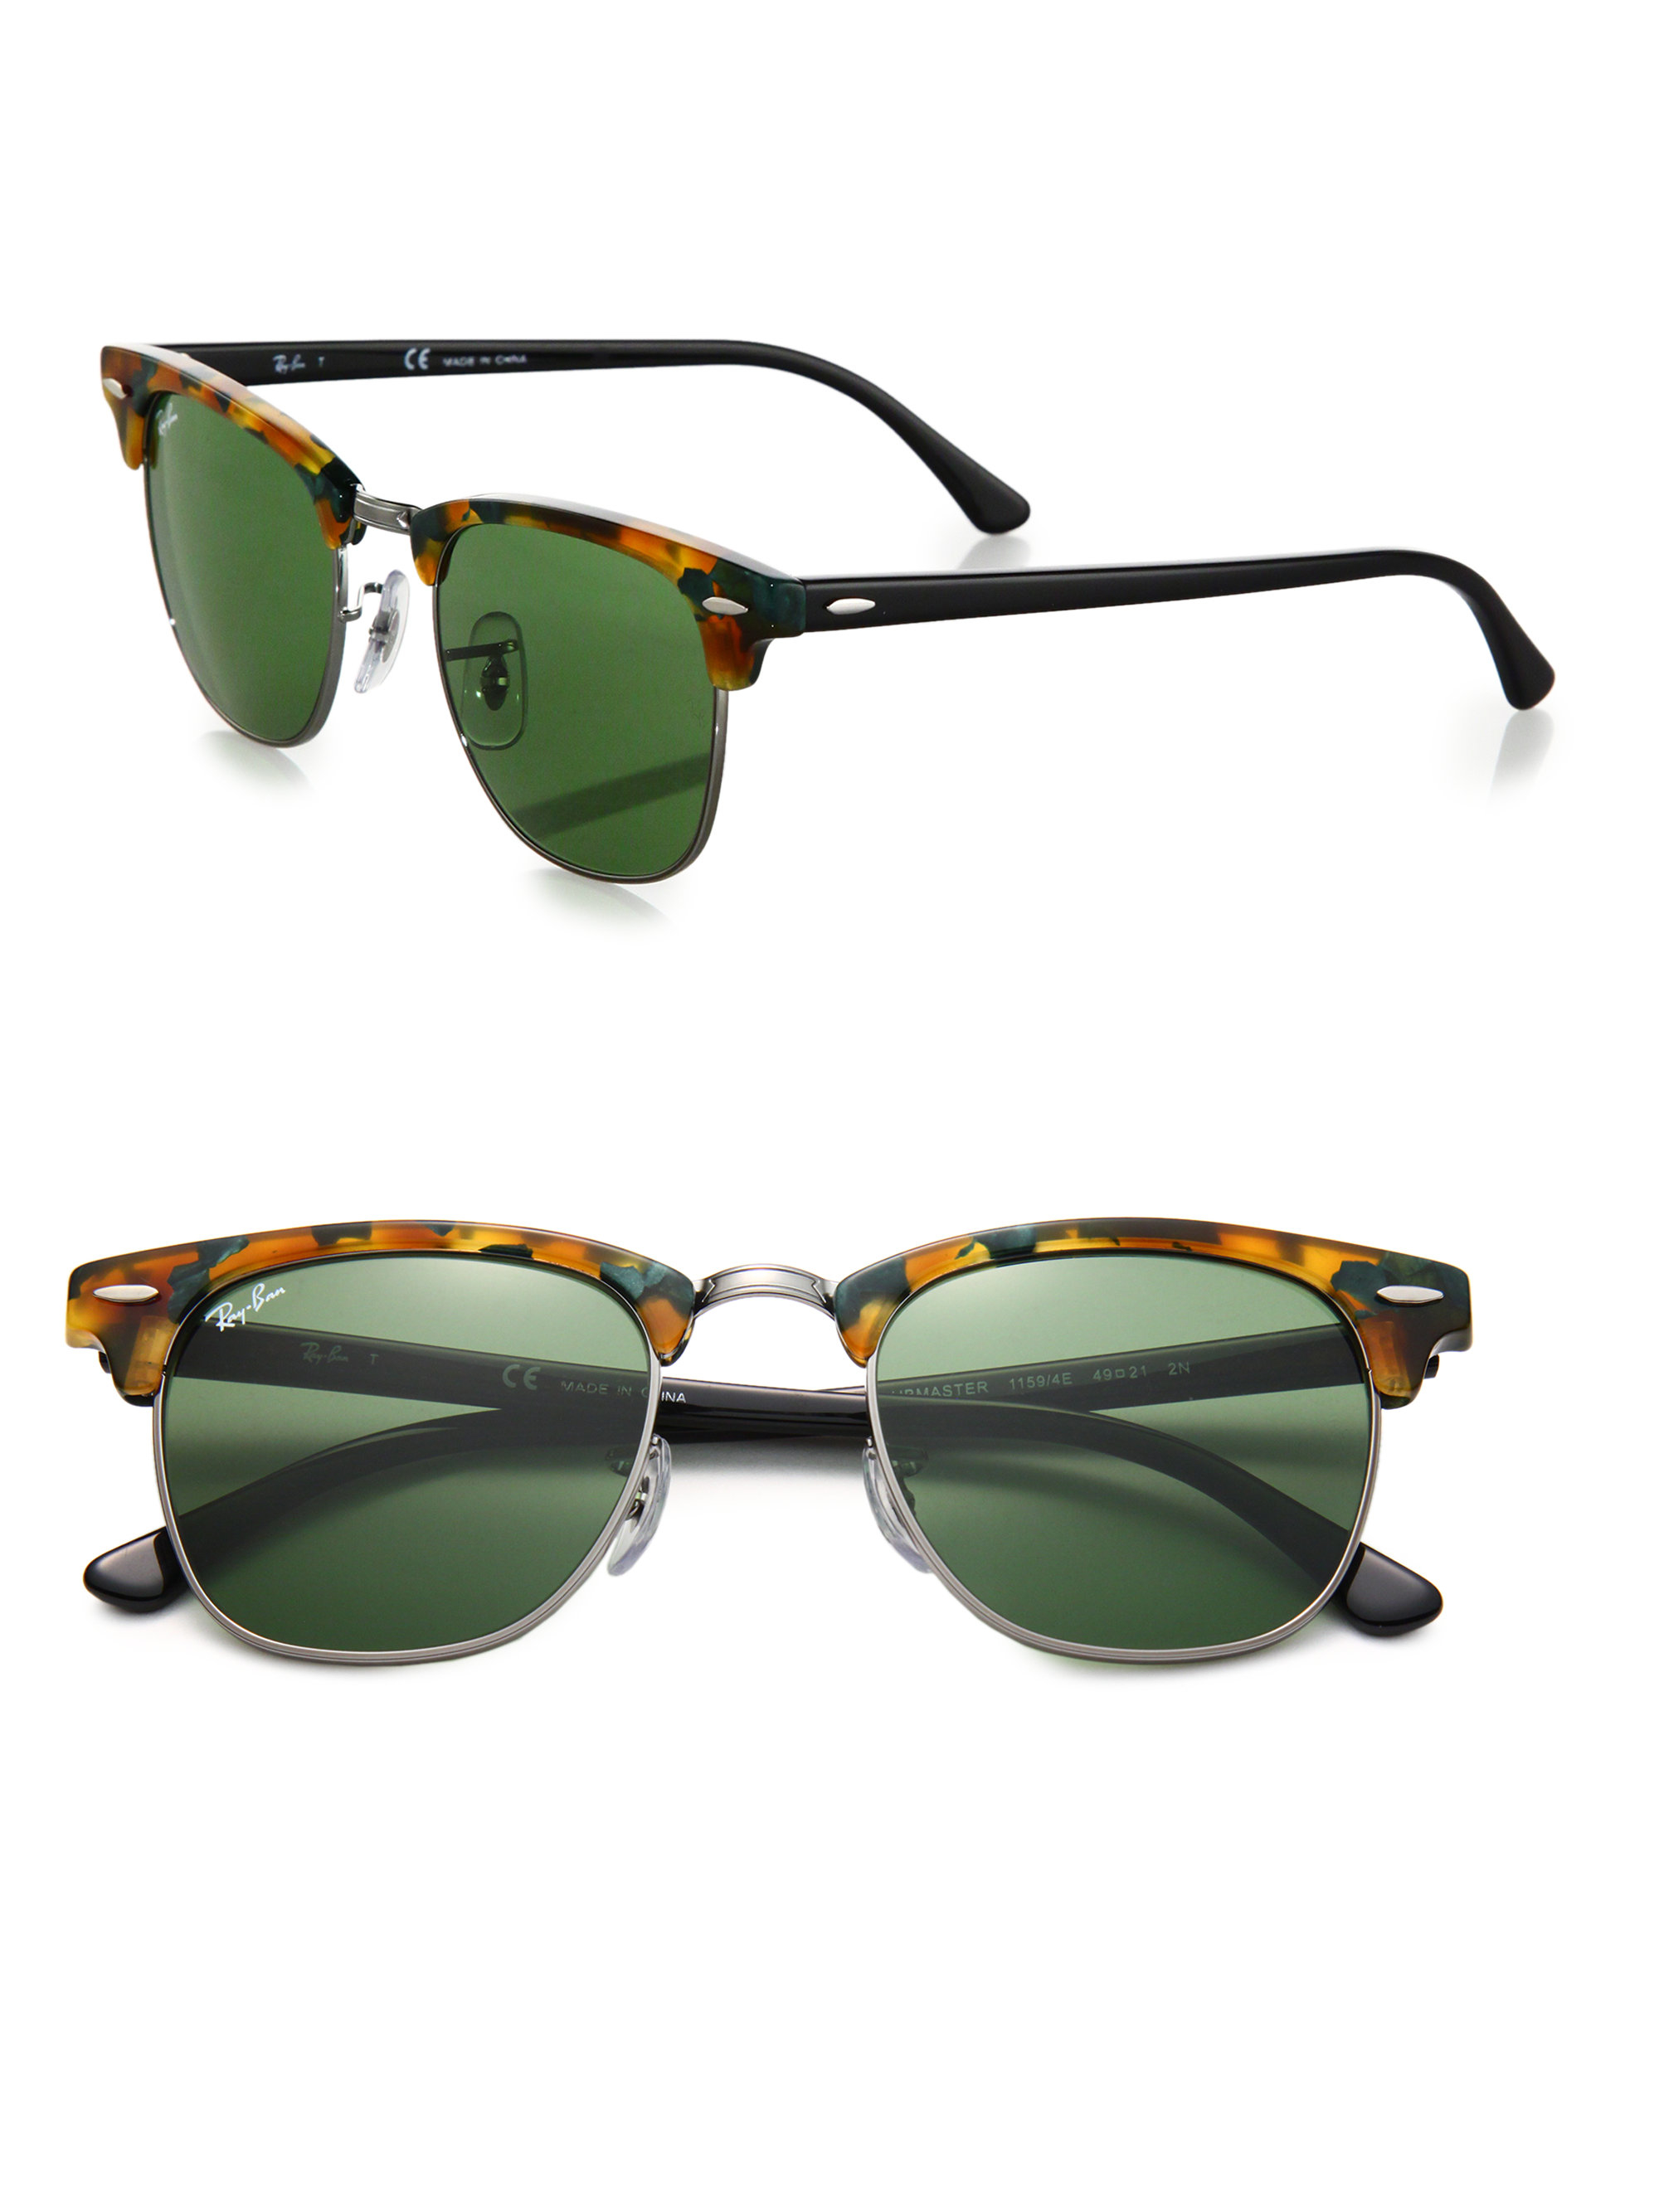 Glasses Frames Vernon Bc : Ray Ban Clubmaster Eyeglasses Green